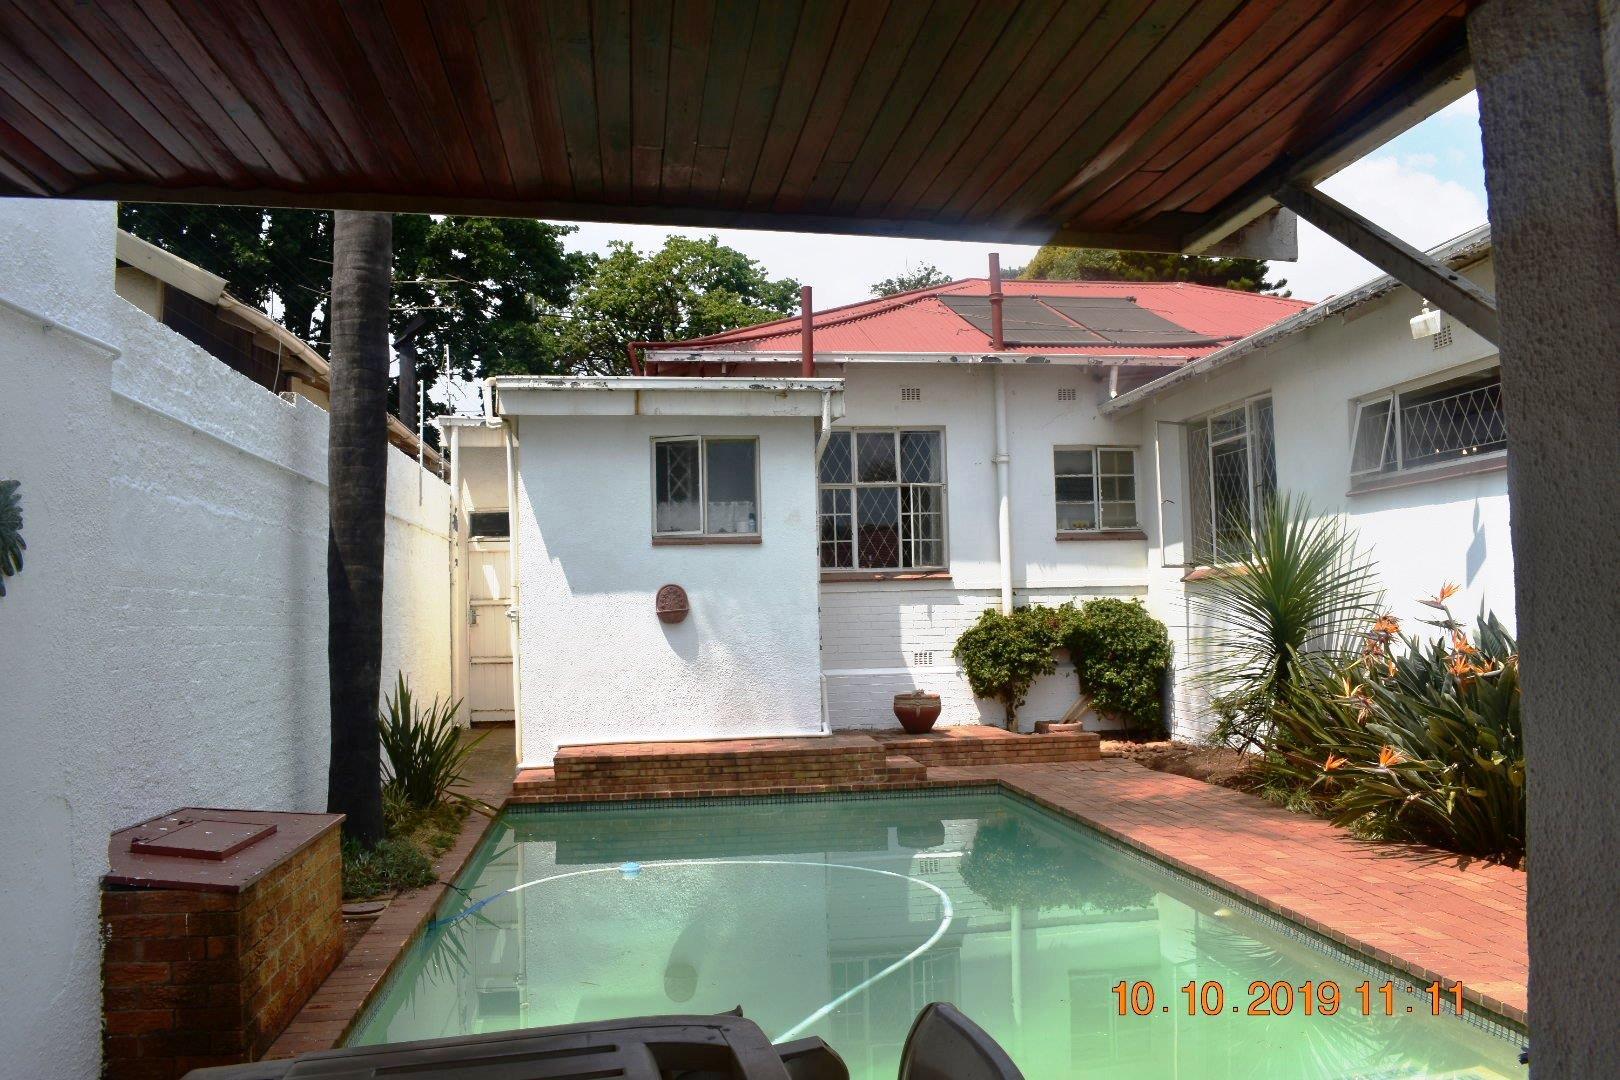 3 Bedroom House For Sale in Kensington